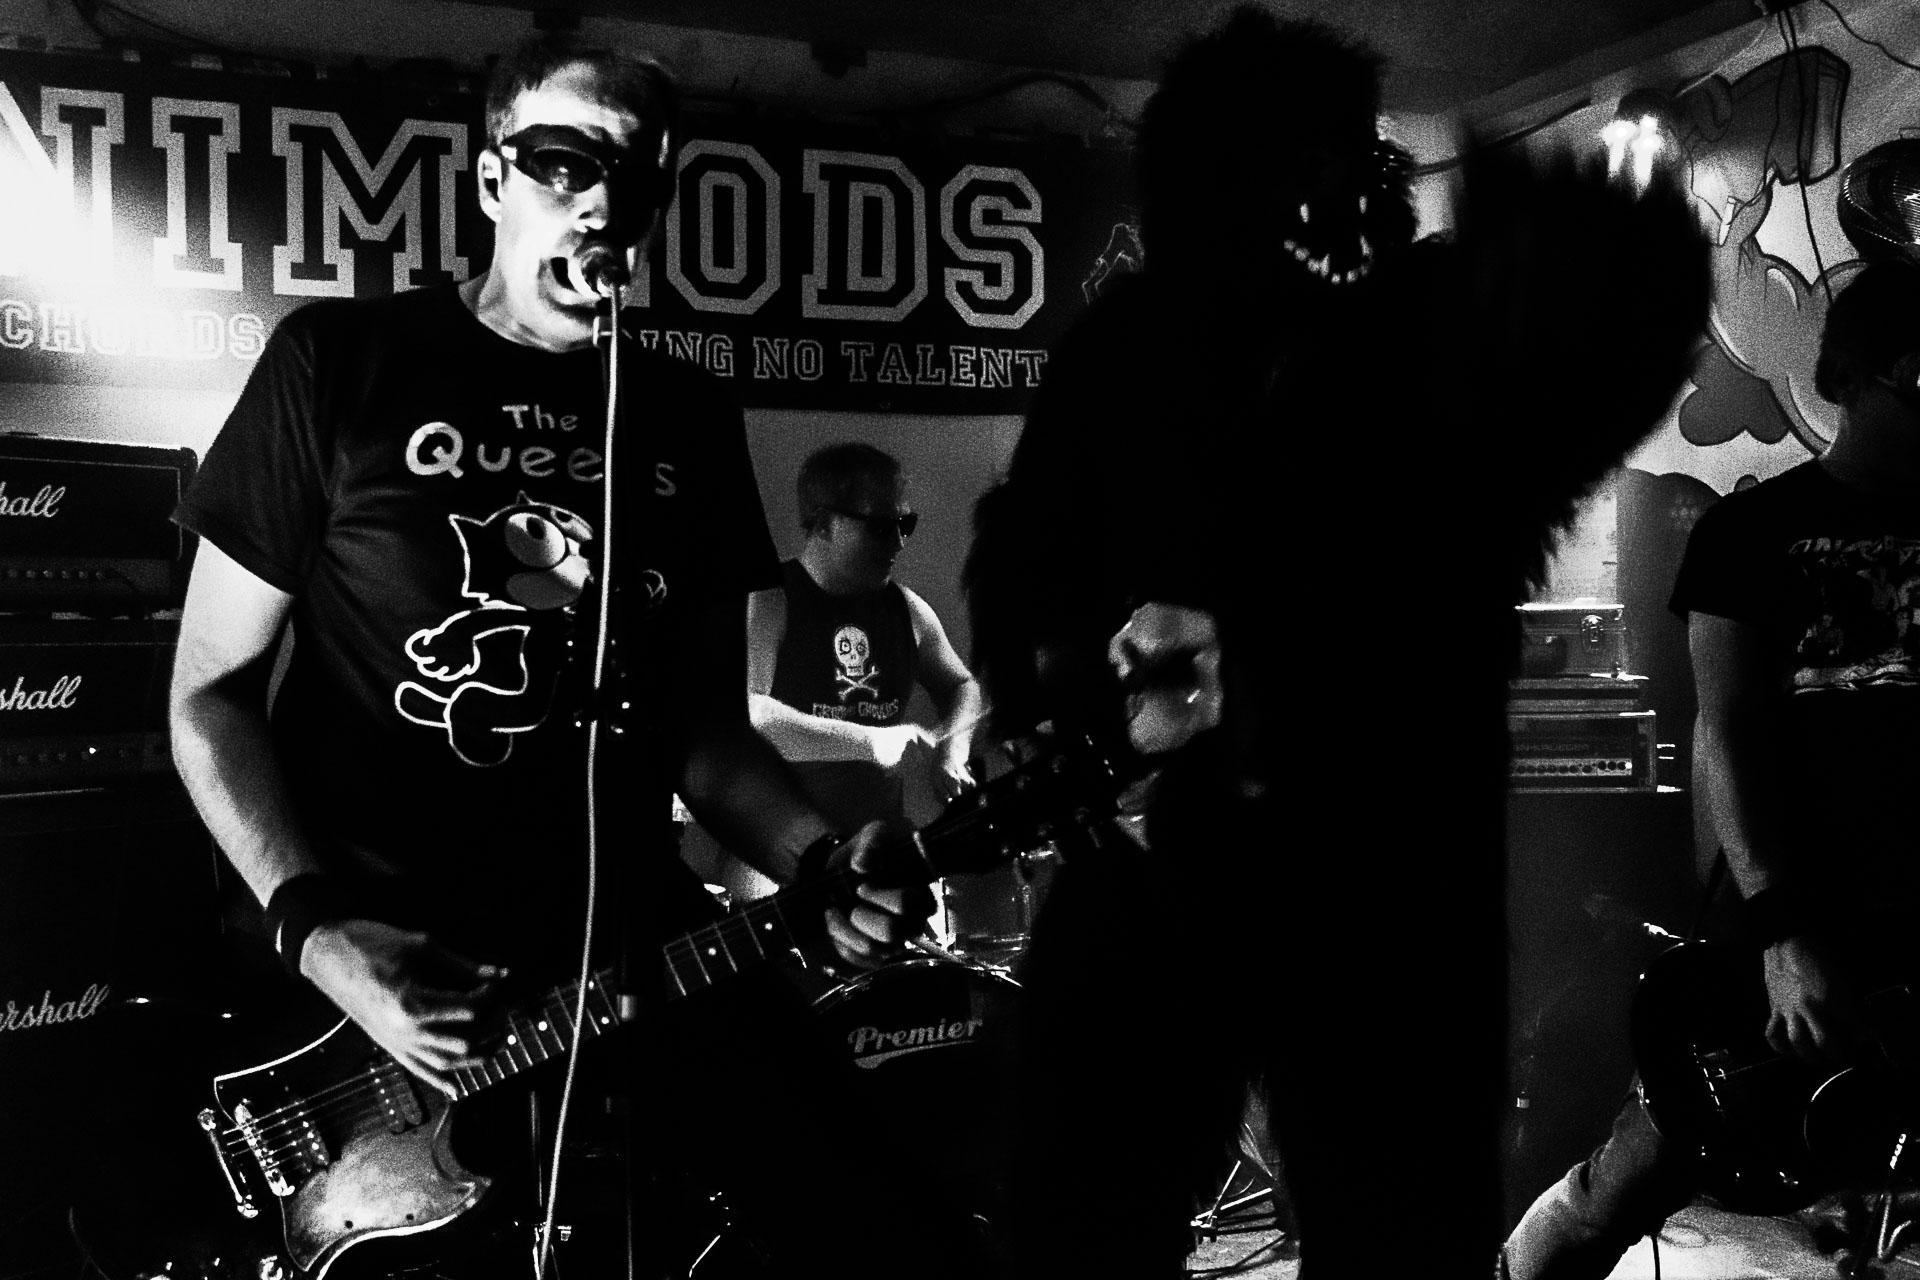 Head + Nimrods